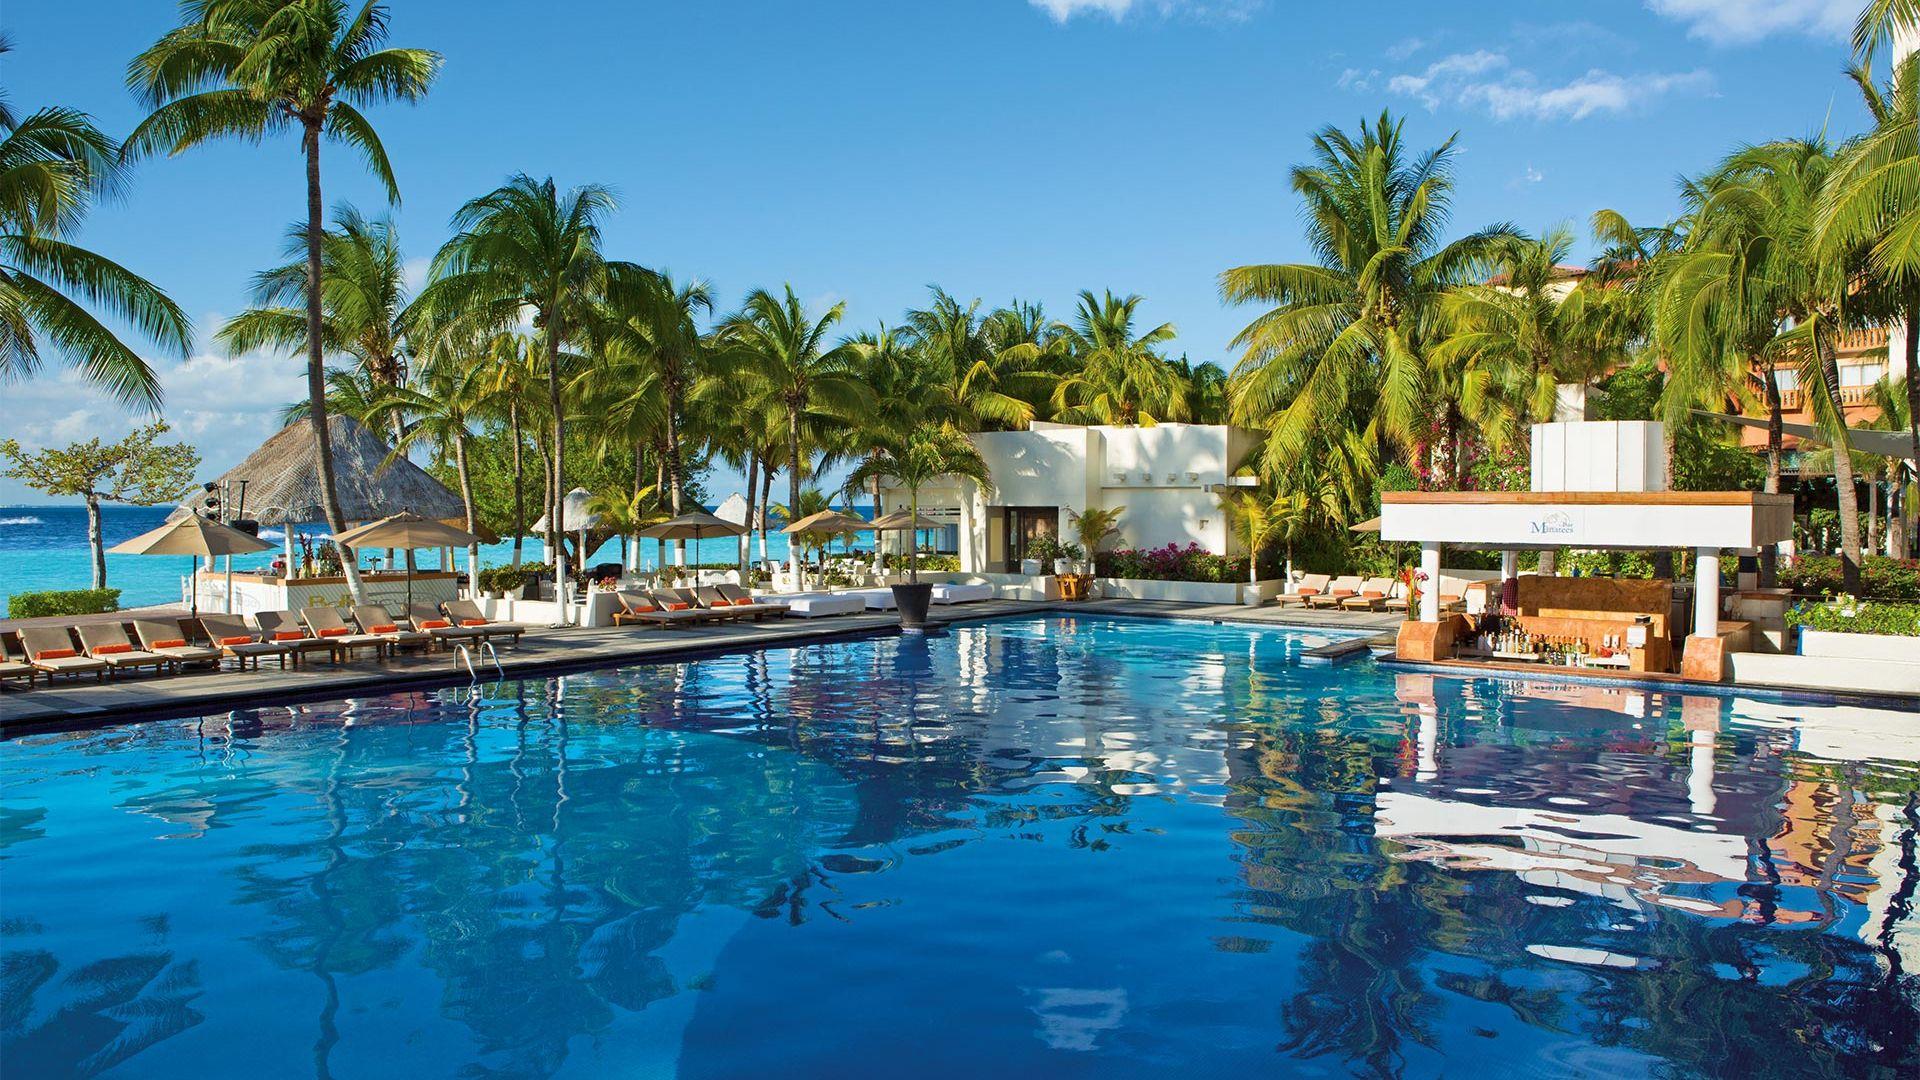 Sejur plaja Riviera Maya, Mexic, 9 zile - ianuarie 2022